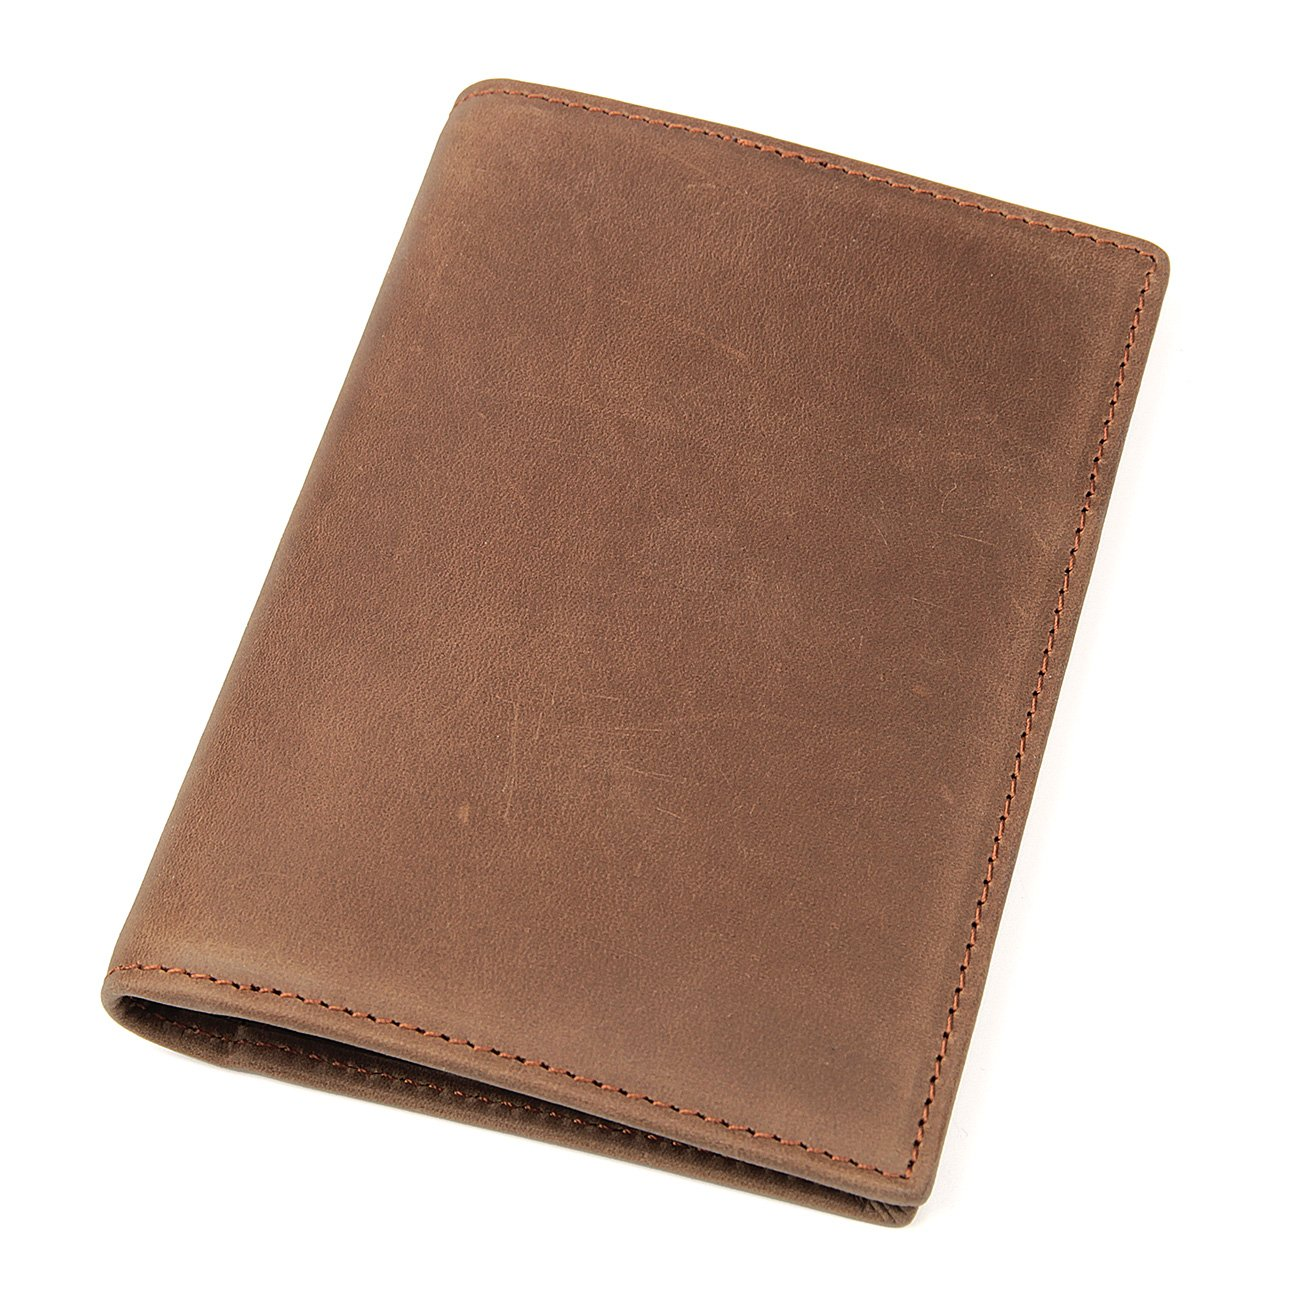 Polare Men's Slim RFID Blocking Leather Passport Holder Travel Bifold Wallet (Light Brown)